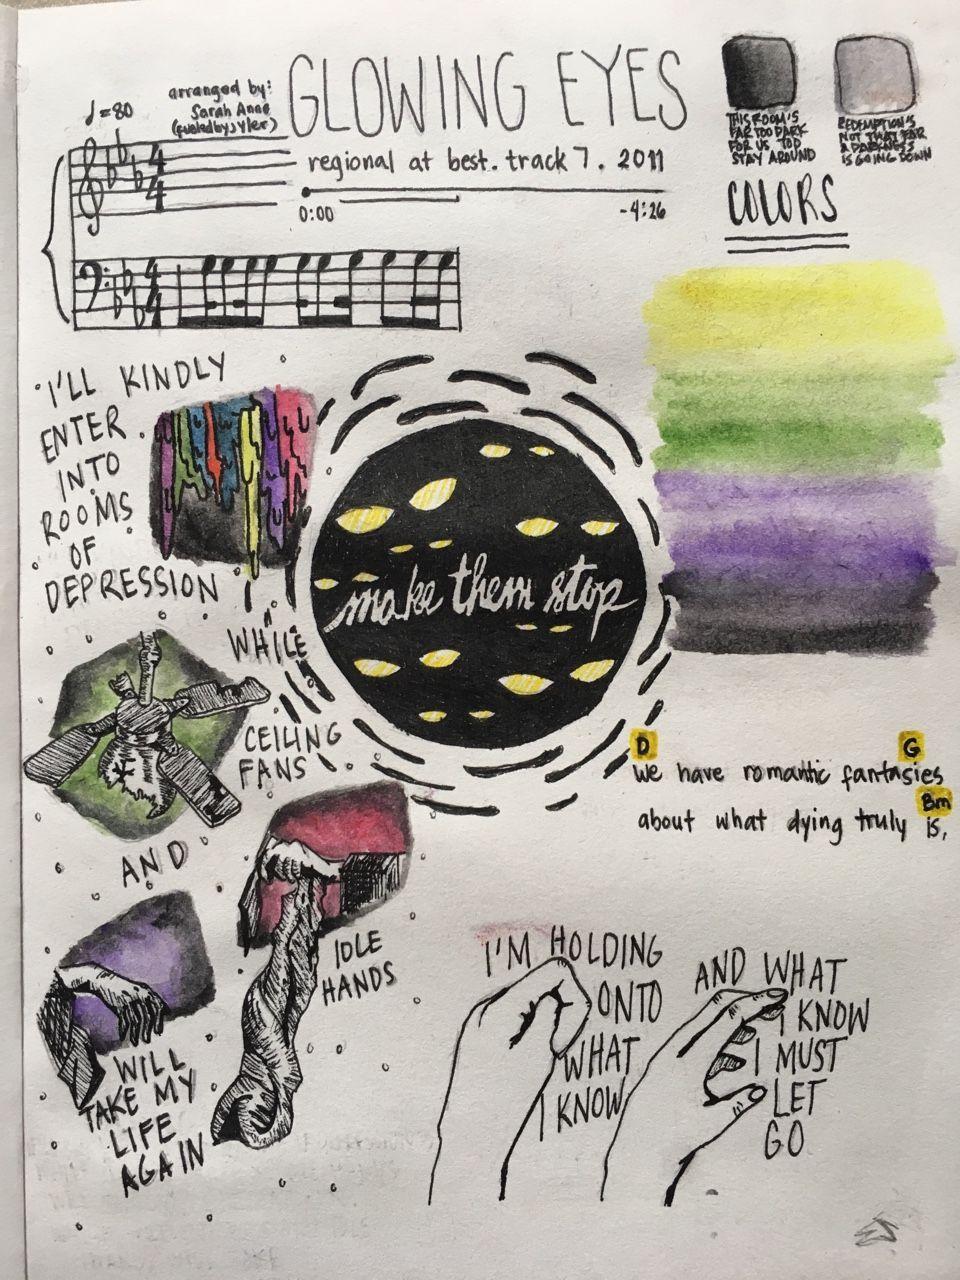 glowing eyes by twenty one pilots art study on tumblr | TOP notch ...